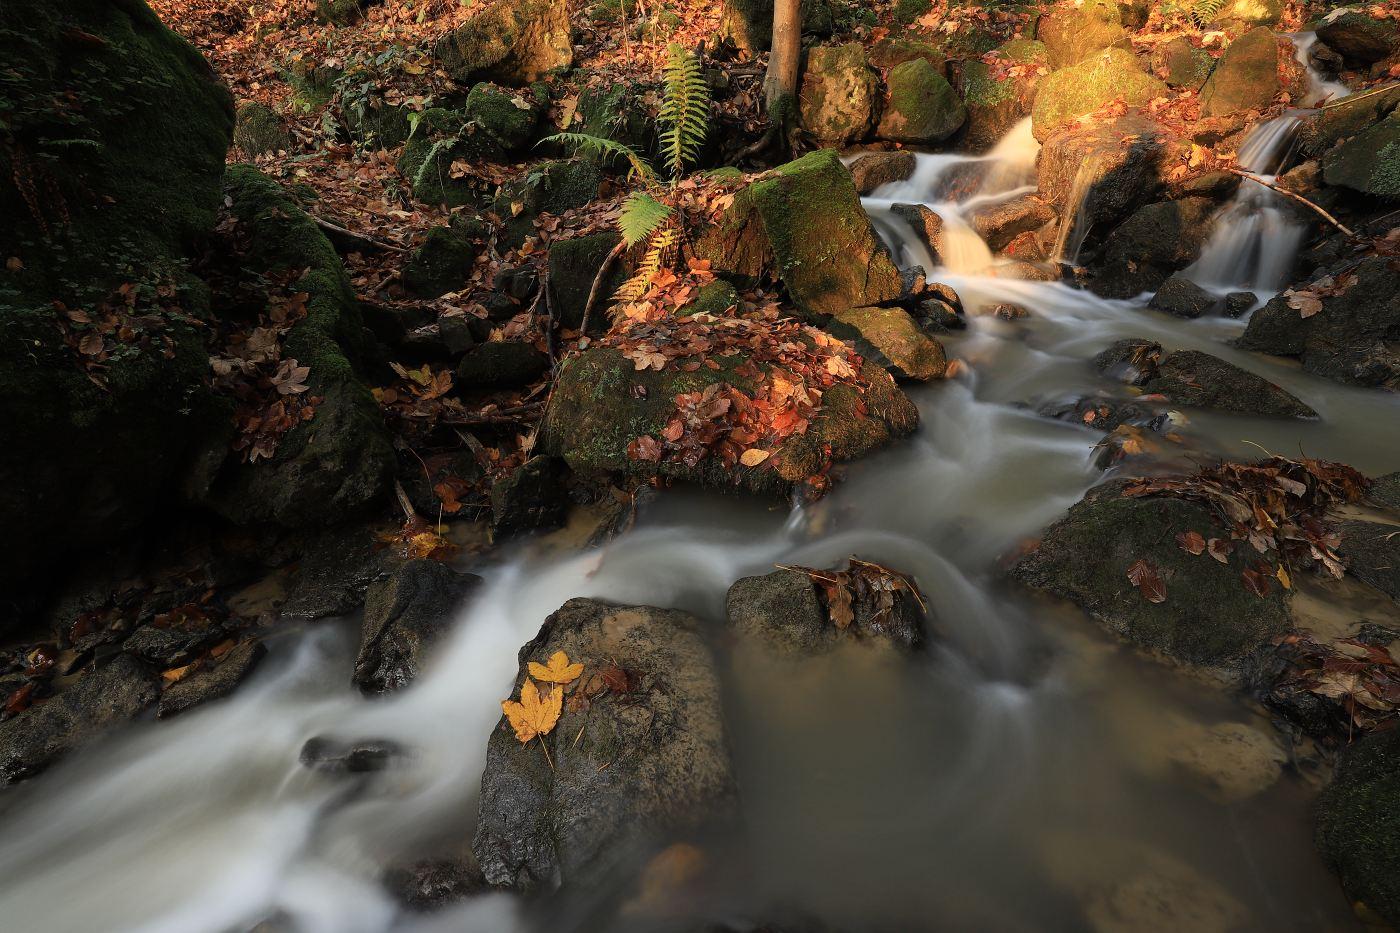 Recenze Canon EOS 6D mark II - vzorové foto, autor fotografie: Michael Jurák